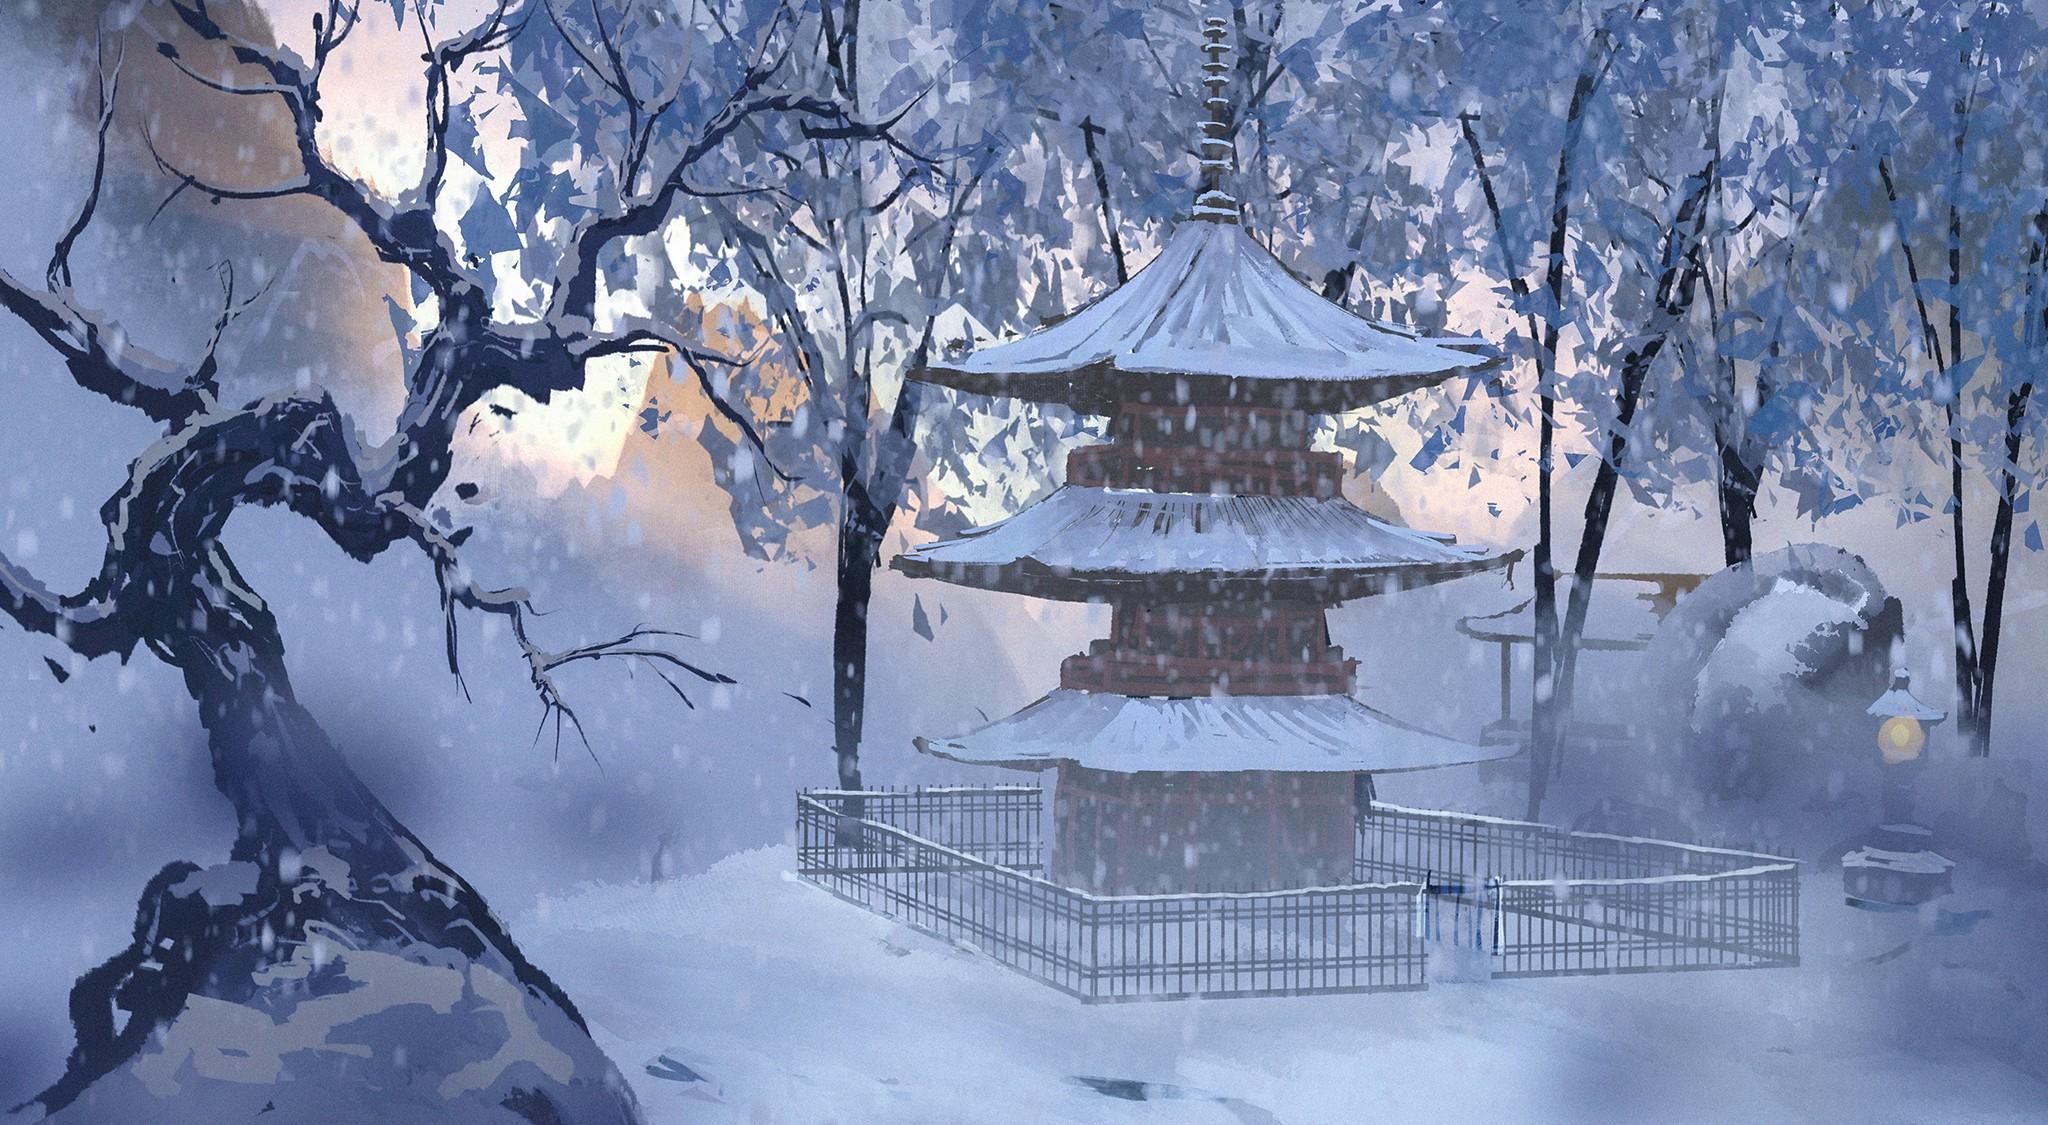 Anime 2048x1125 anime temple winter snow Surendra Rajawat